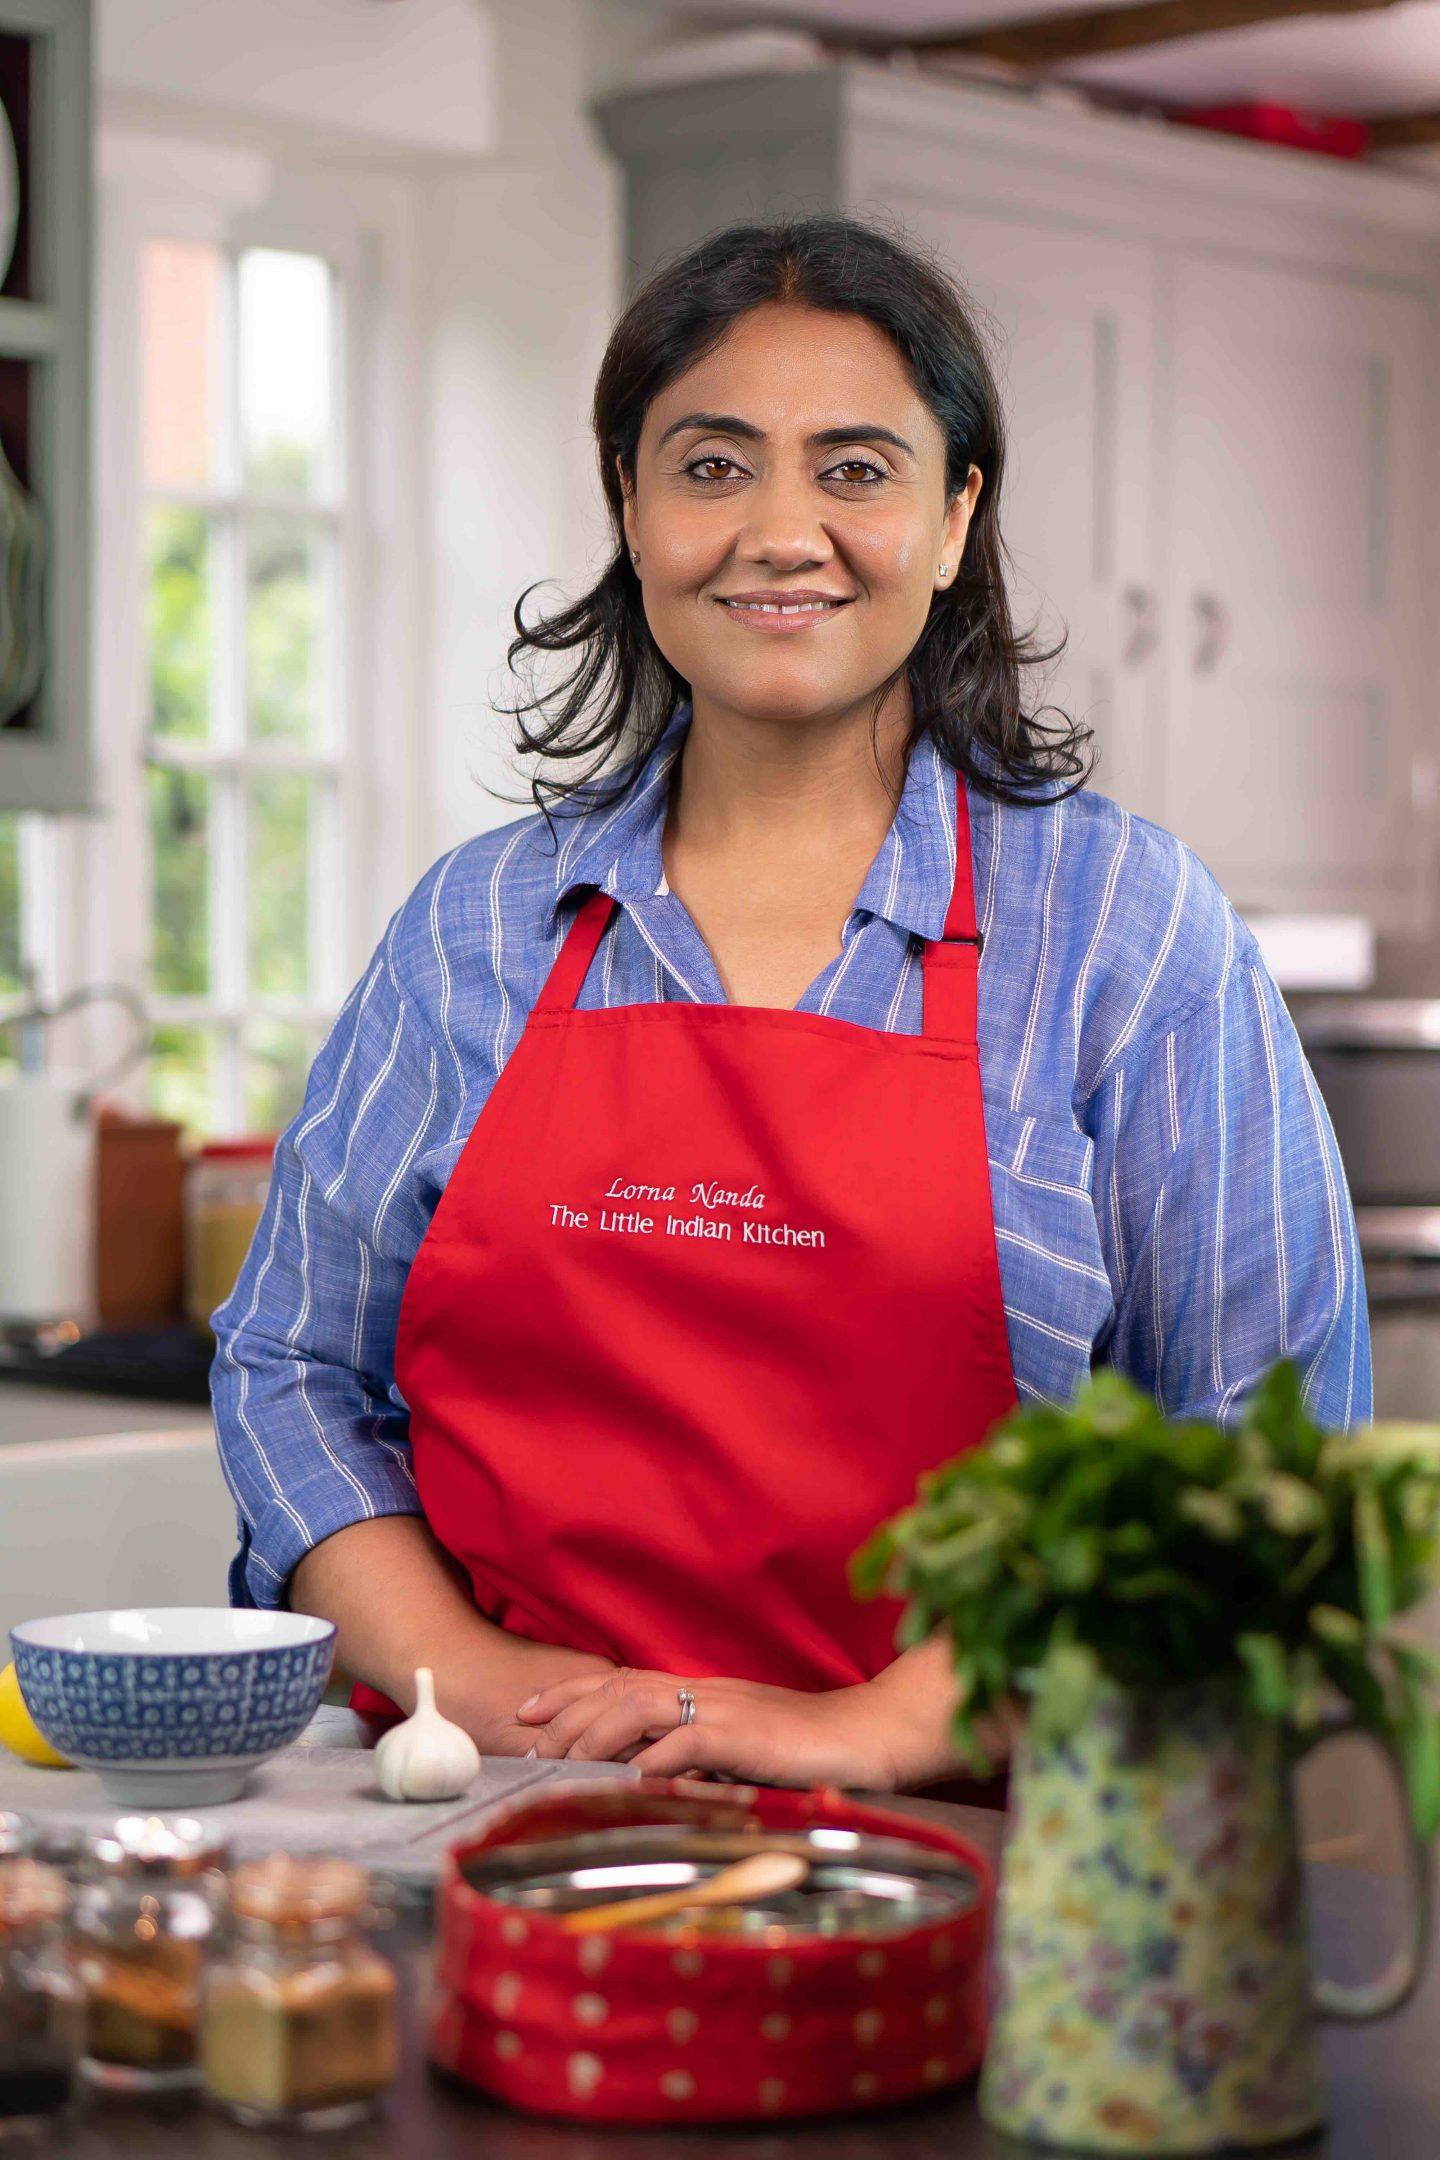 Lorna Nanda Gangotra, a successful woman in business as featured in The Homeworker